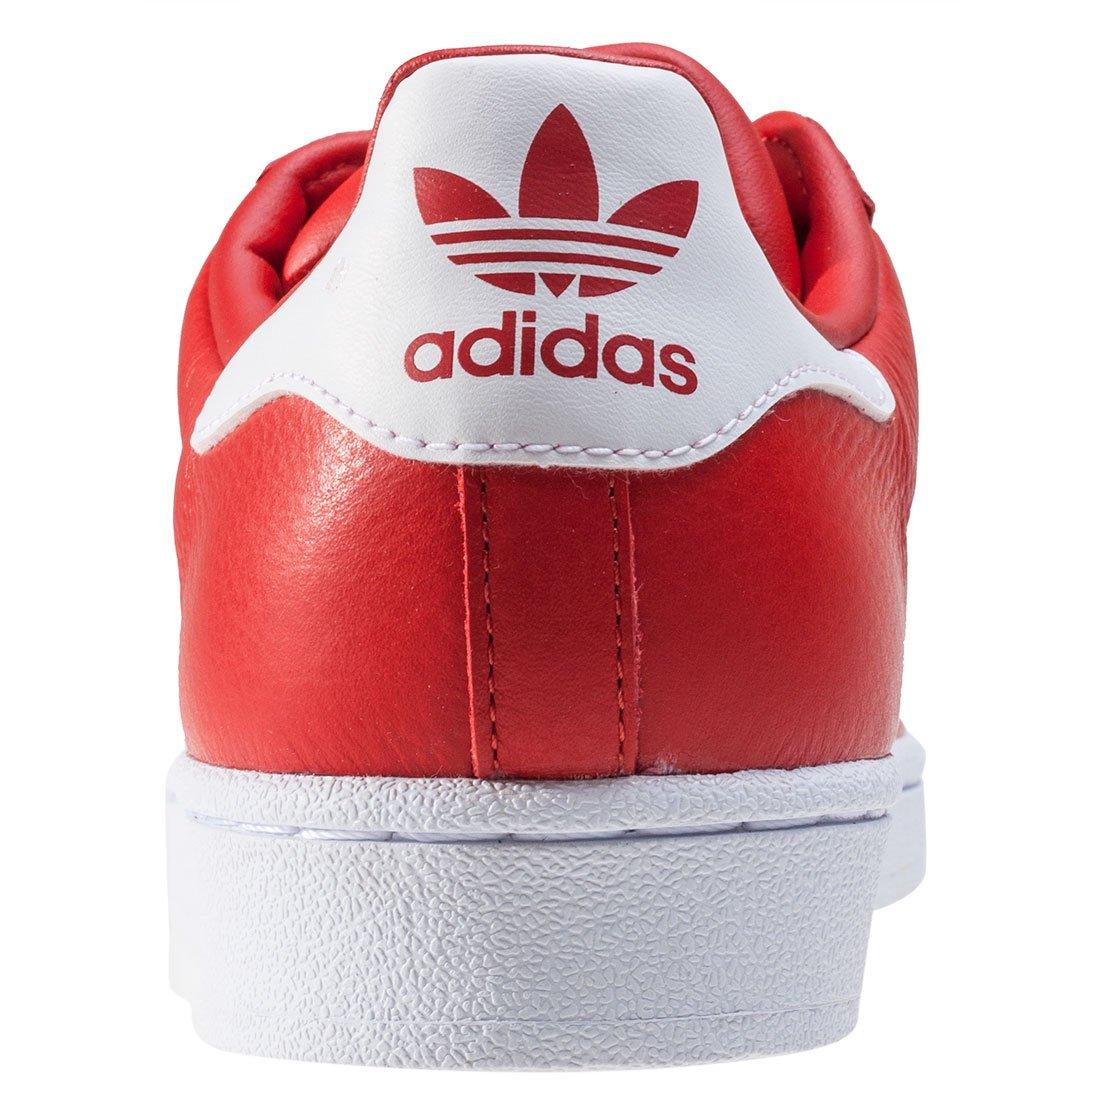 Adidas Originals Unisex-Erwachsene Superstar Superstar Superstar Weave Turnschuhe Navy Weiß Blau e4d5e1